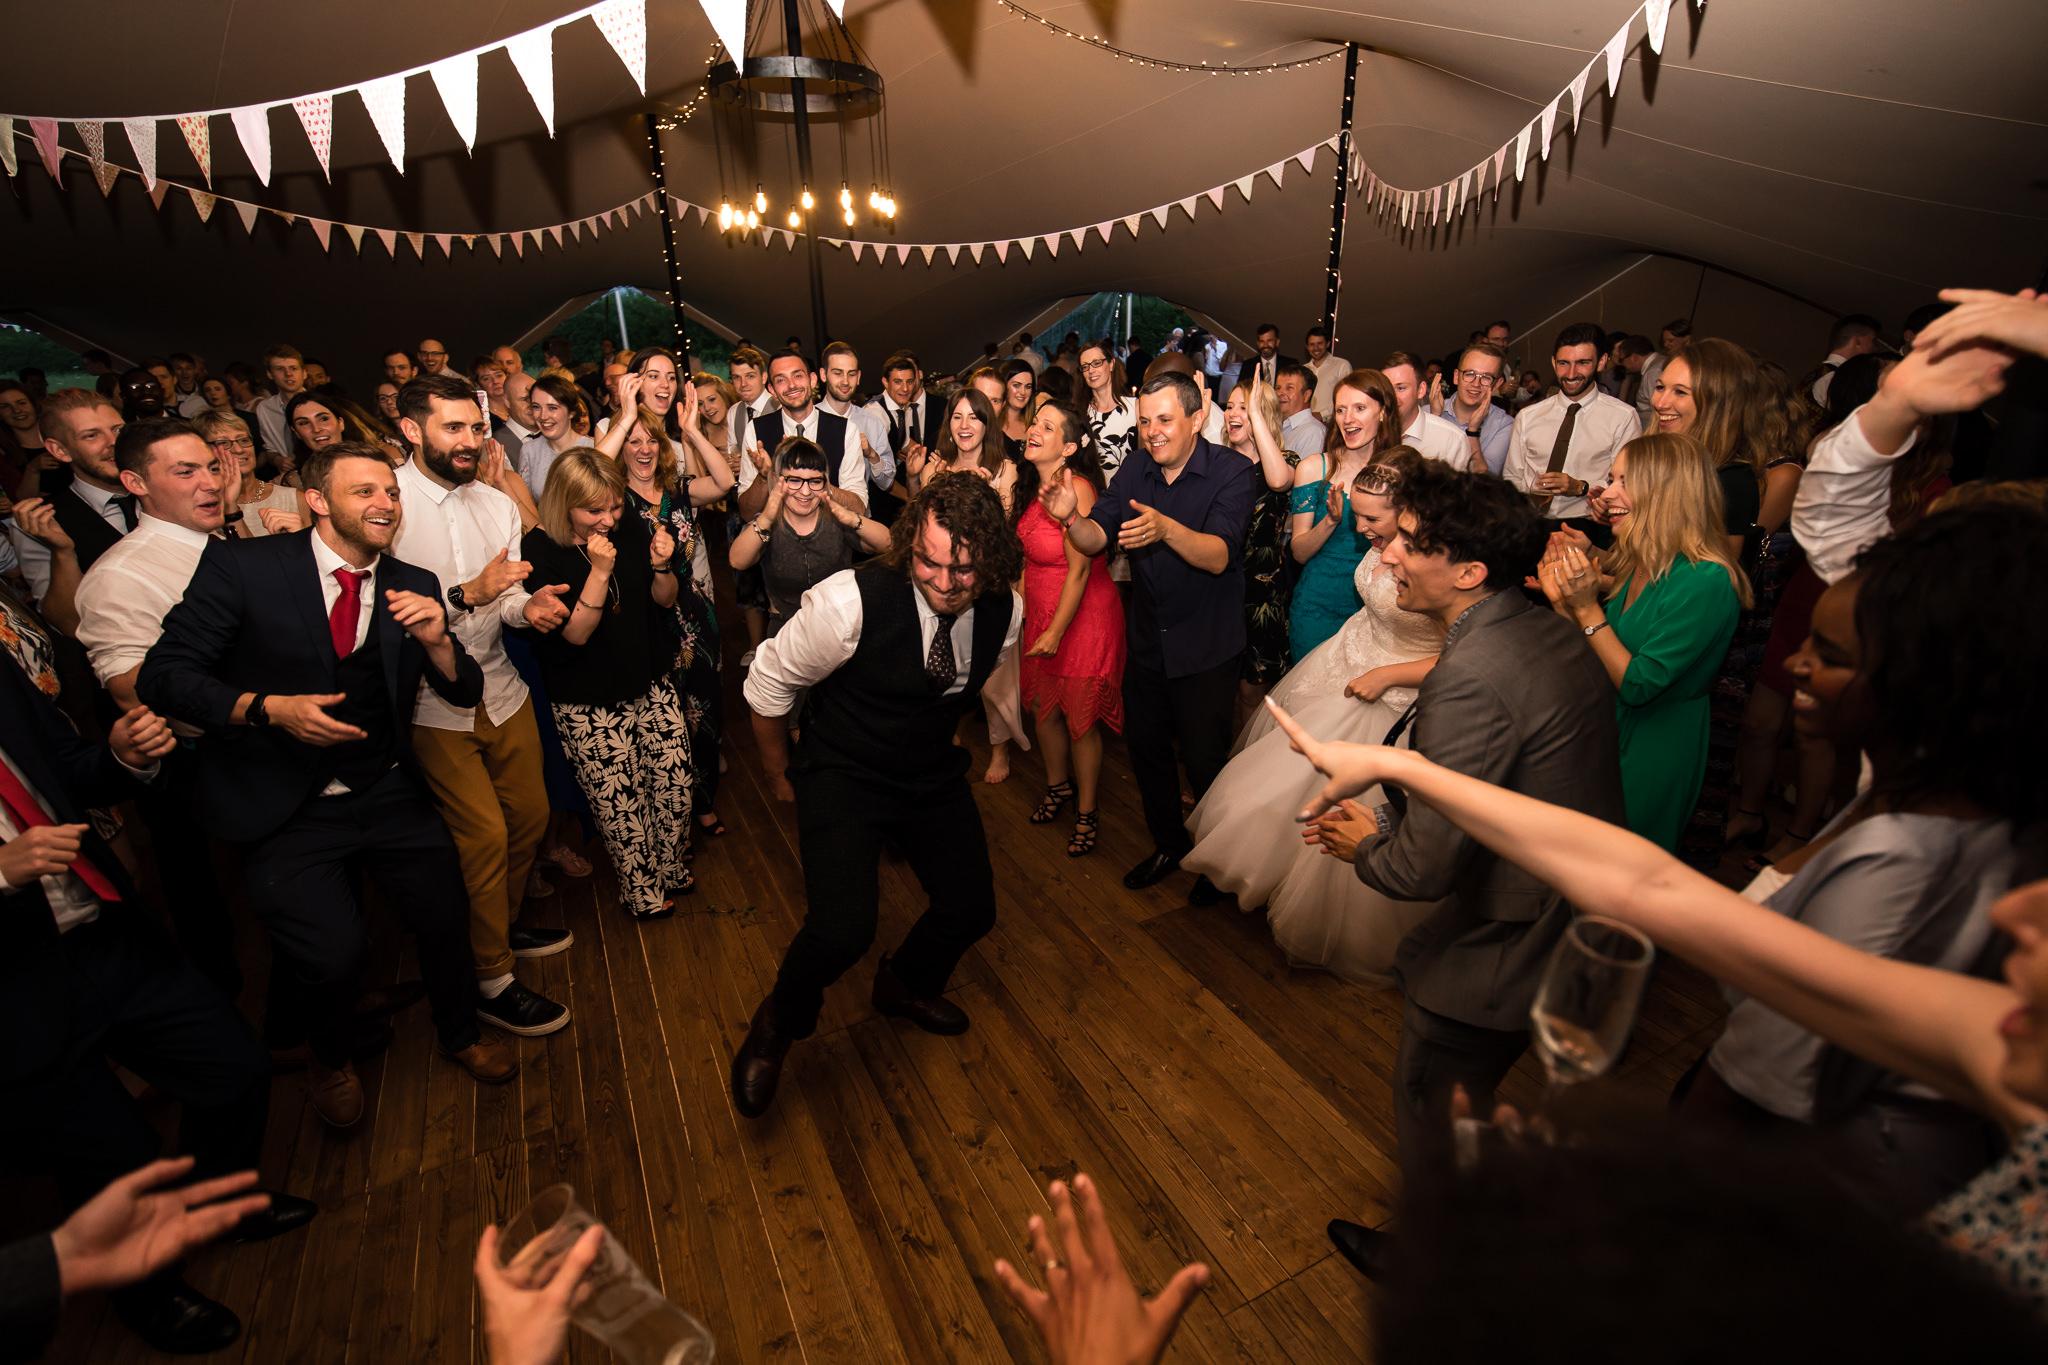 nottingham wedding78